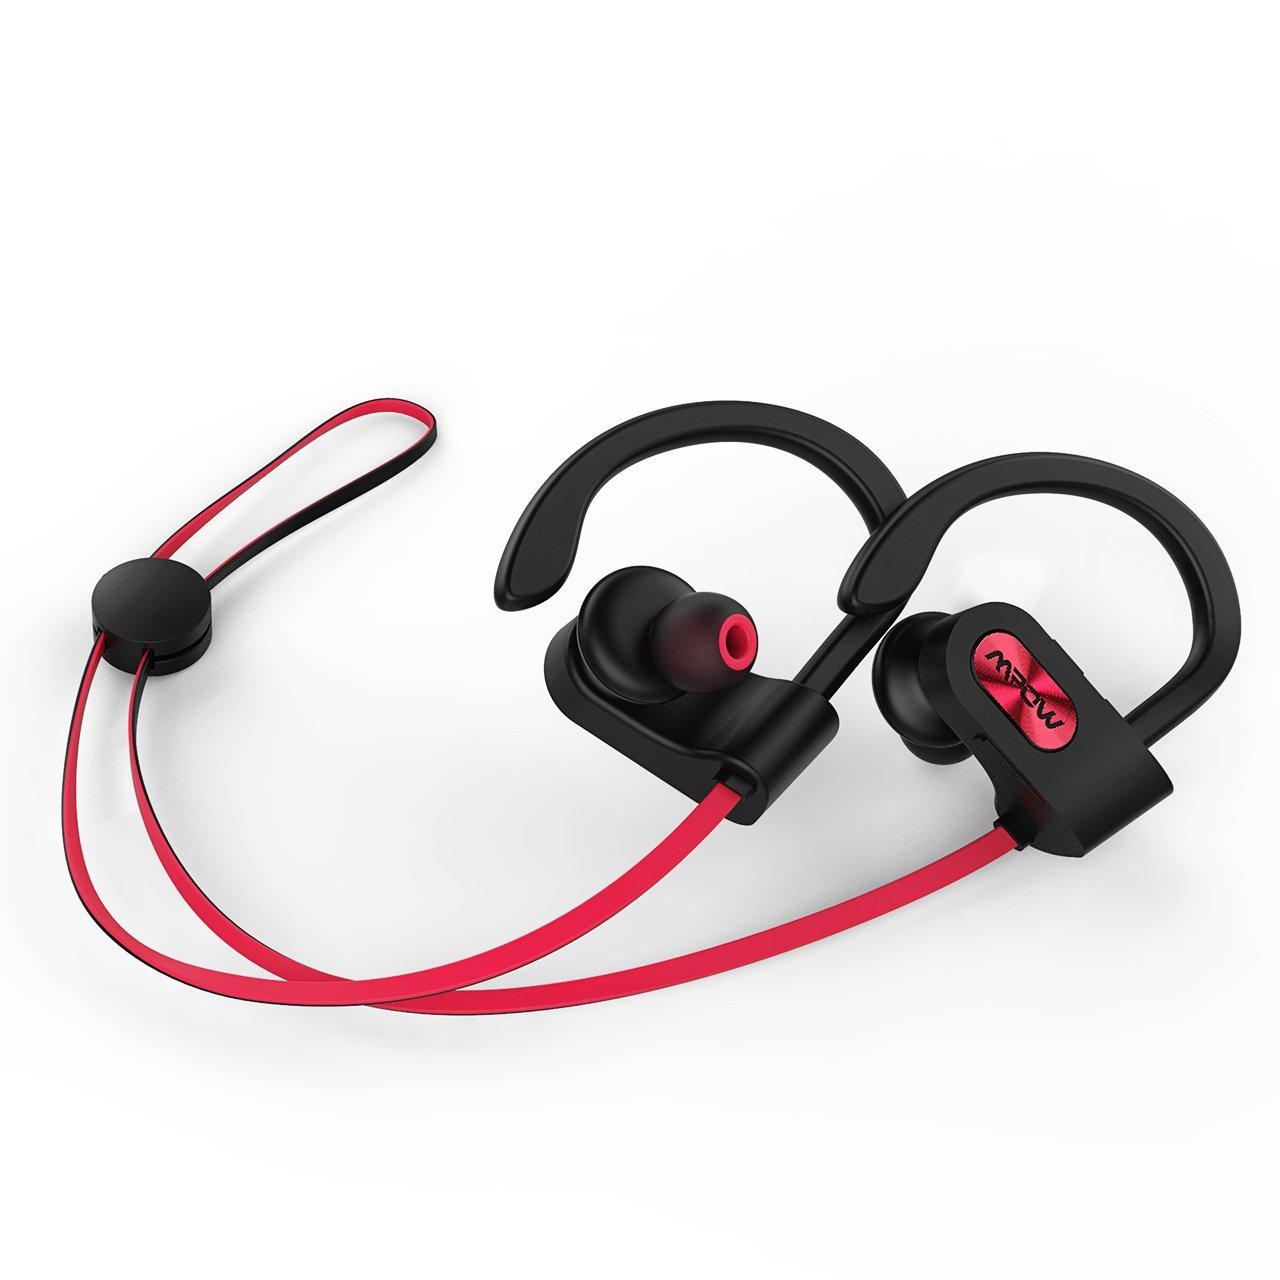 Mpow bluetooth headphones waterproof - bluetooth converter for headphones